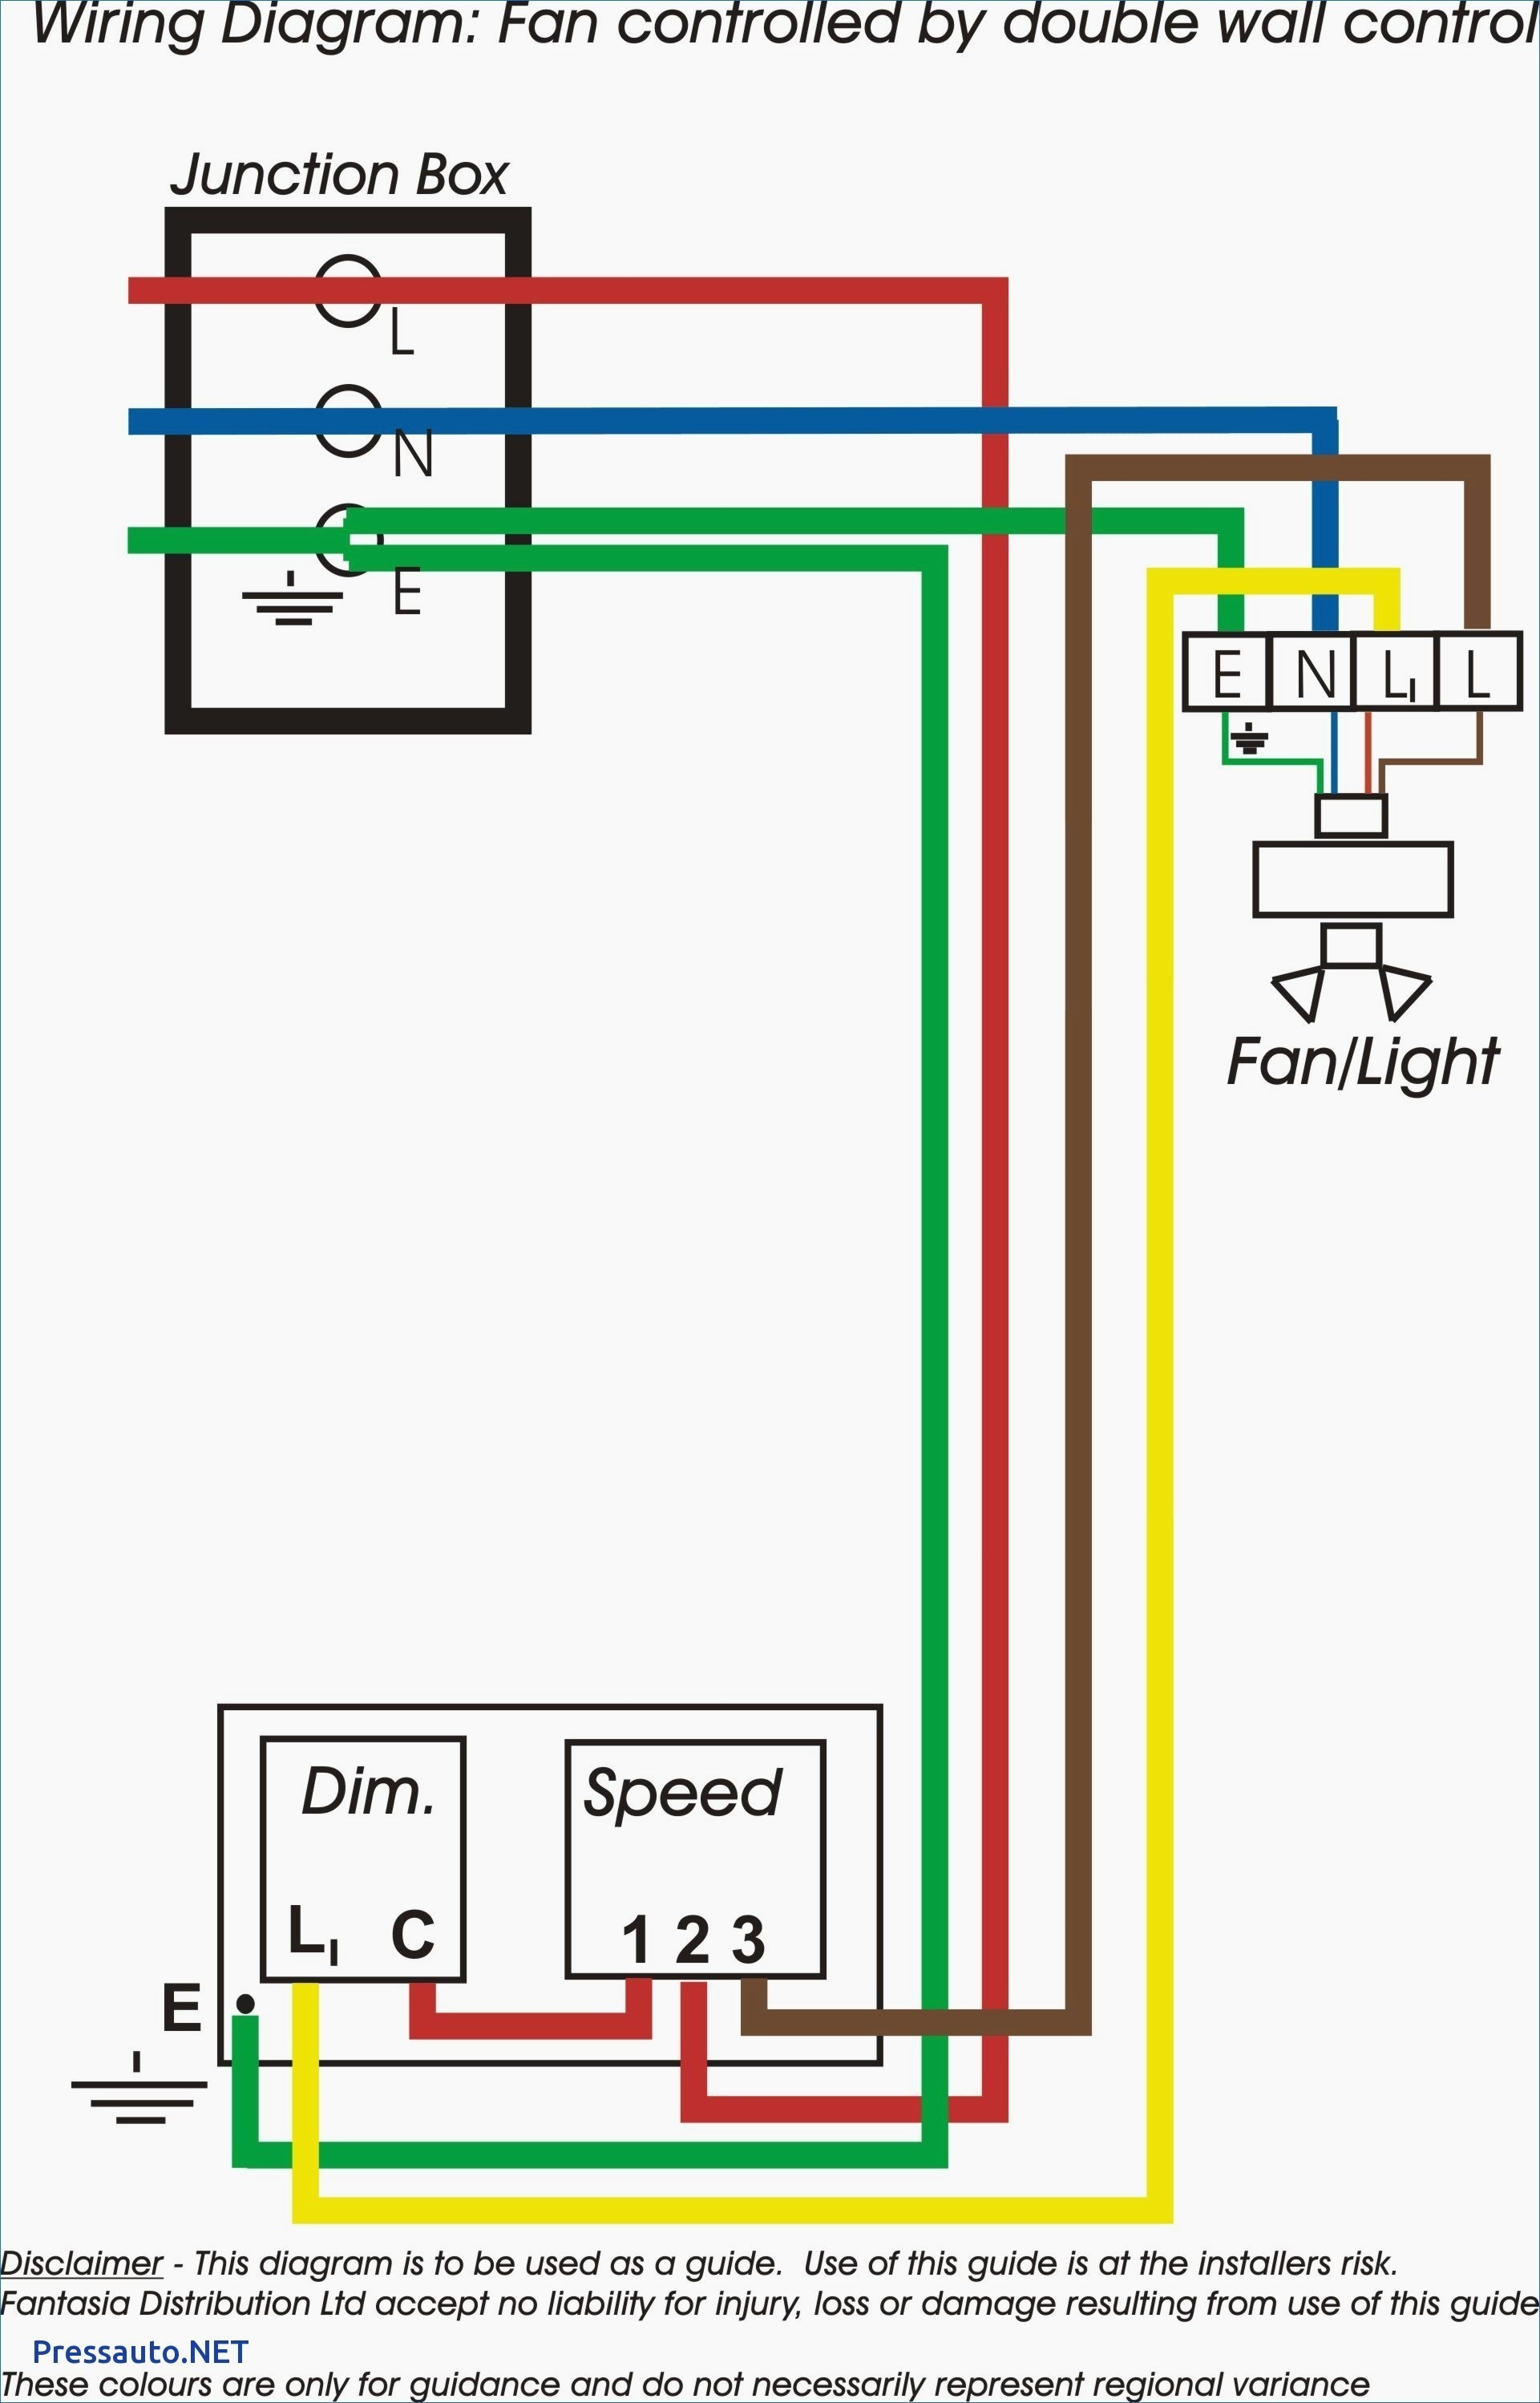 Wiring Diagram Switch Leg Inspirationa Wiring Diagram for Delta Light Switch Fresh Wiring Diagram A 2